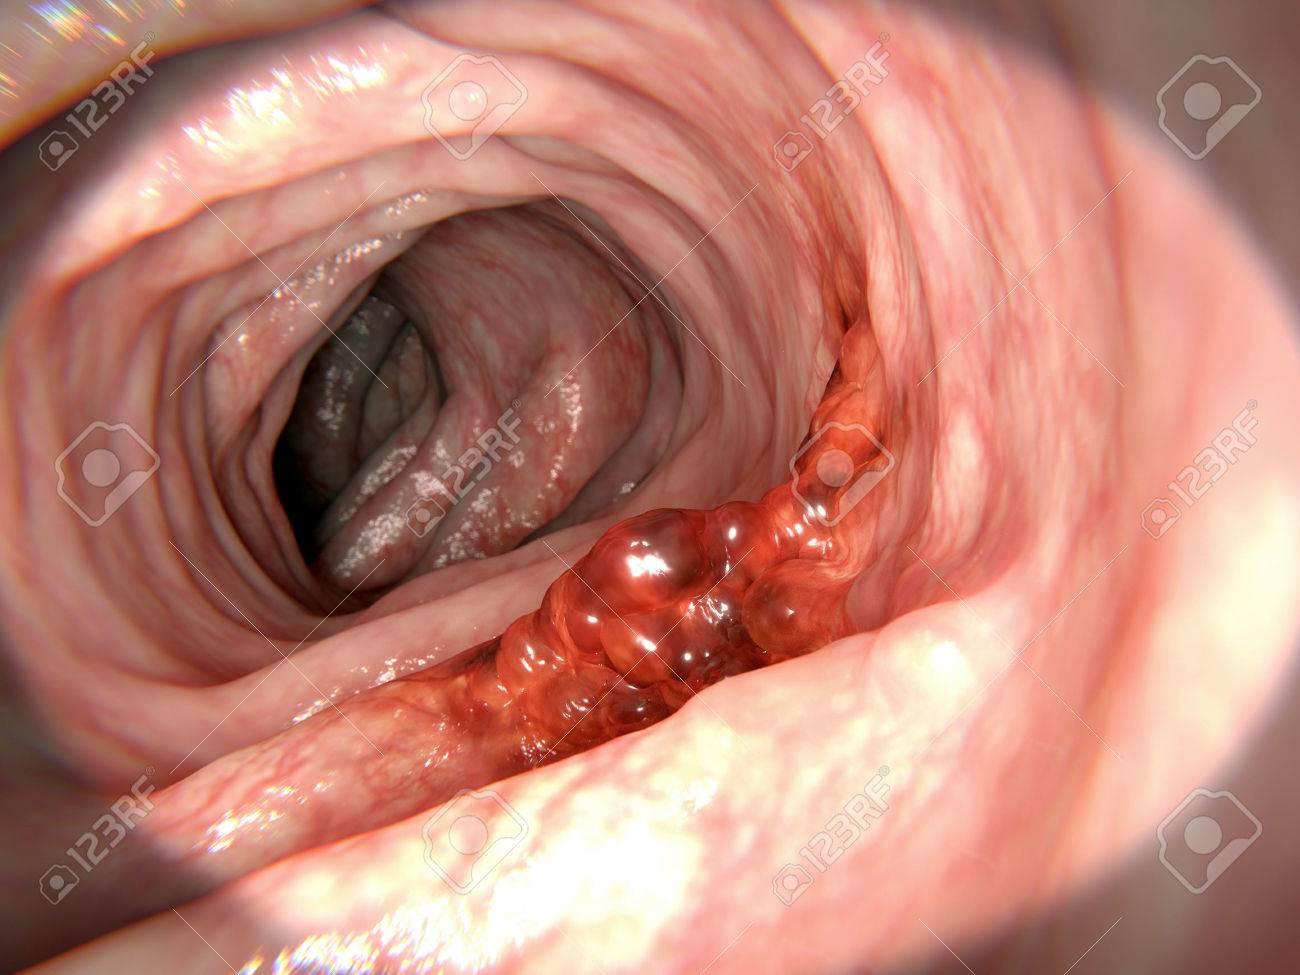 remede contre papillomavirus